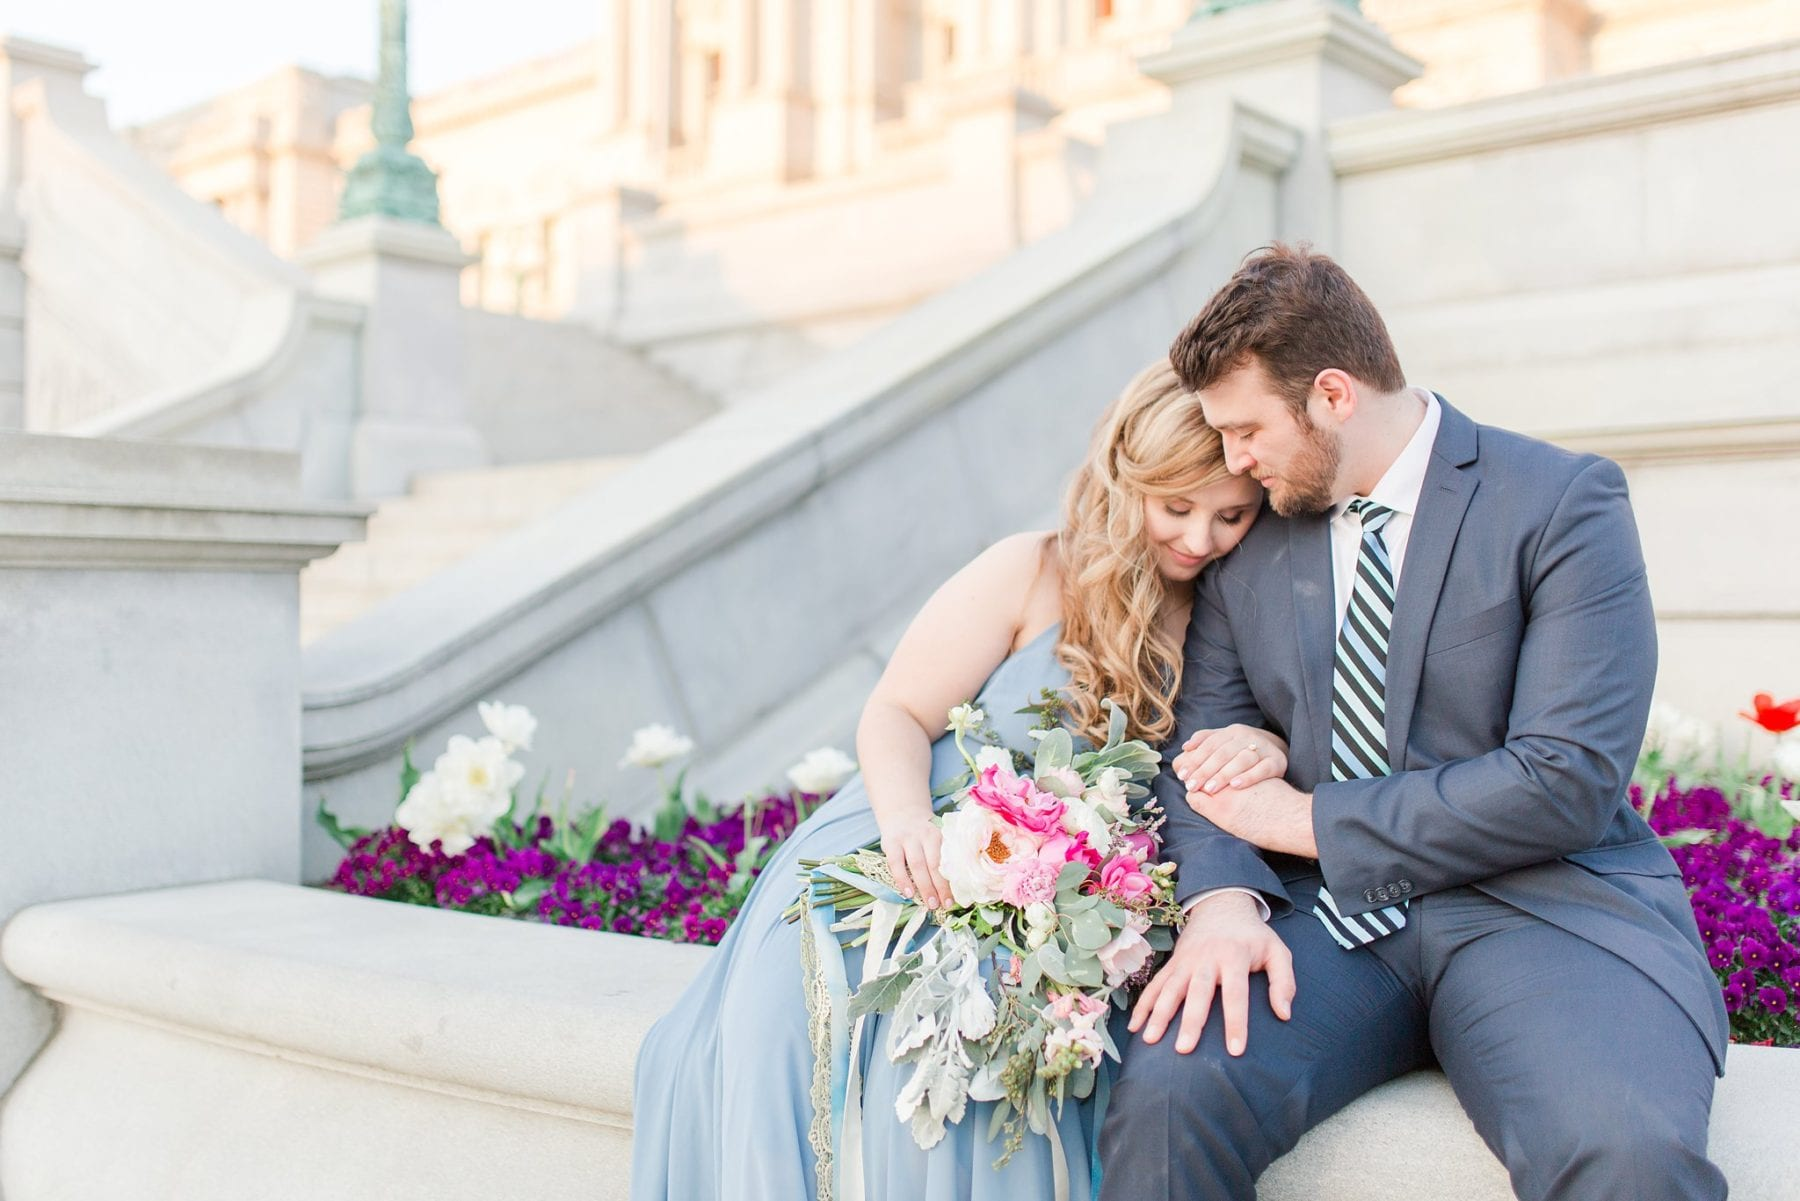 Capitol Hill Engagement Photos Kelly & Zach Washington DC Wedding Photographer Megan Kelsey Photography-275.jpg